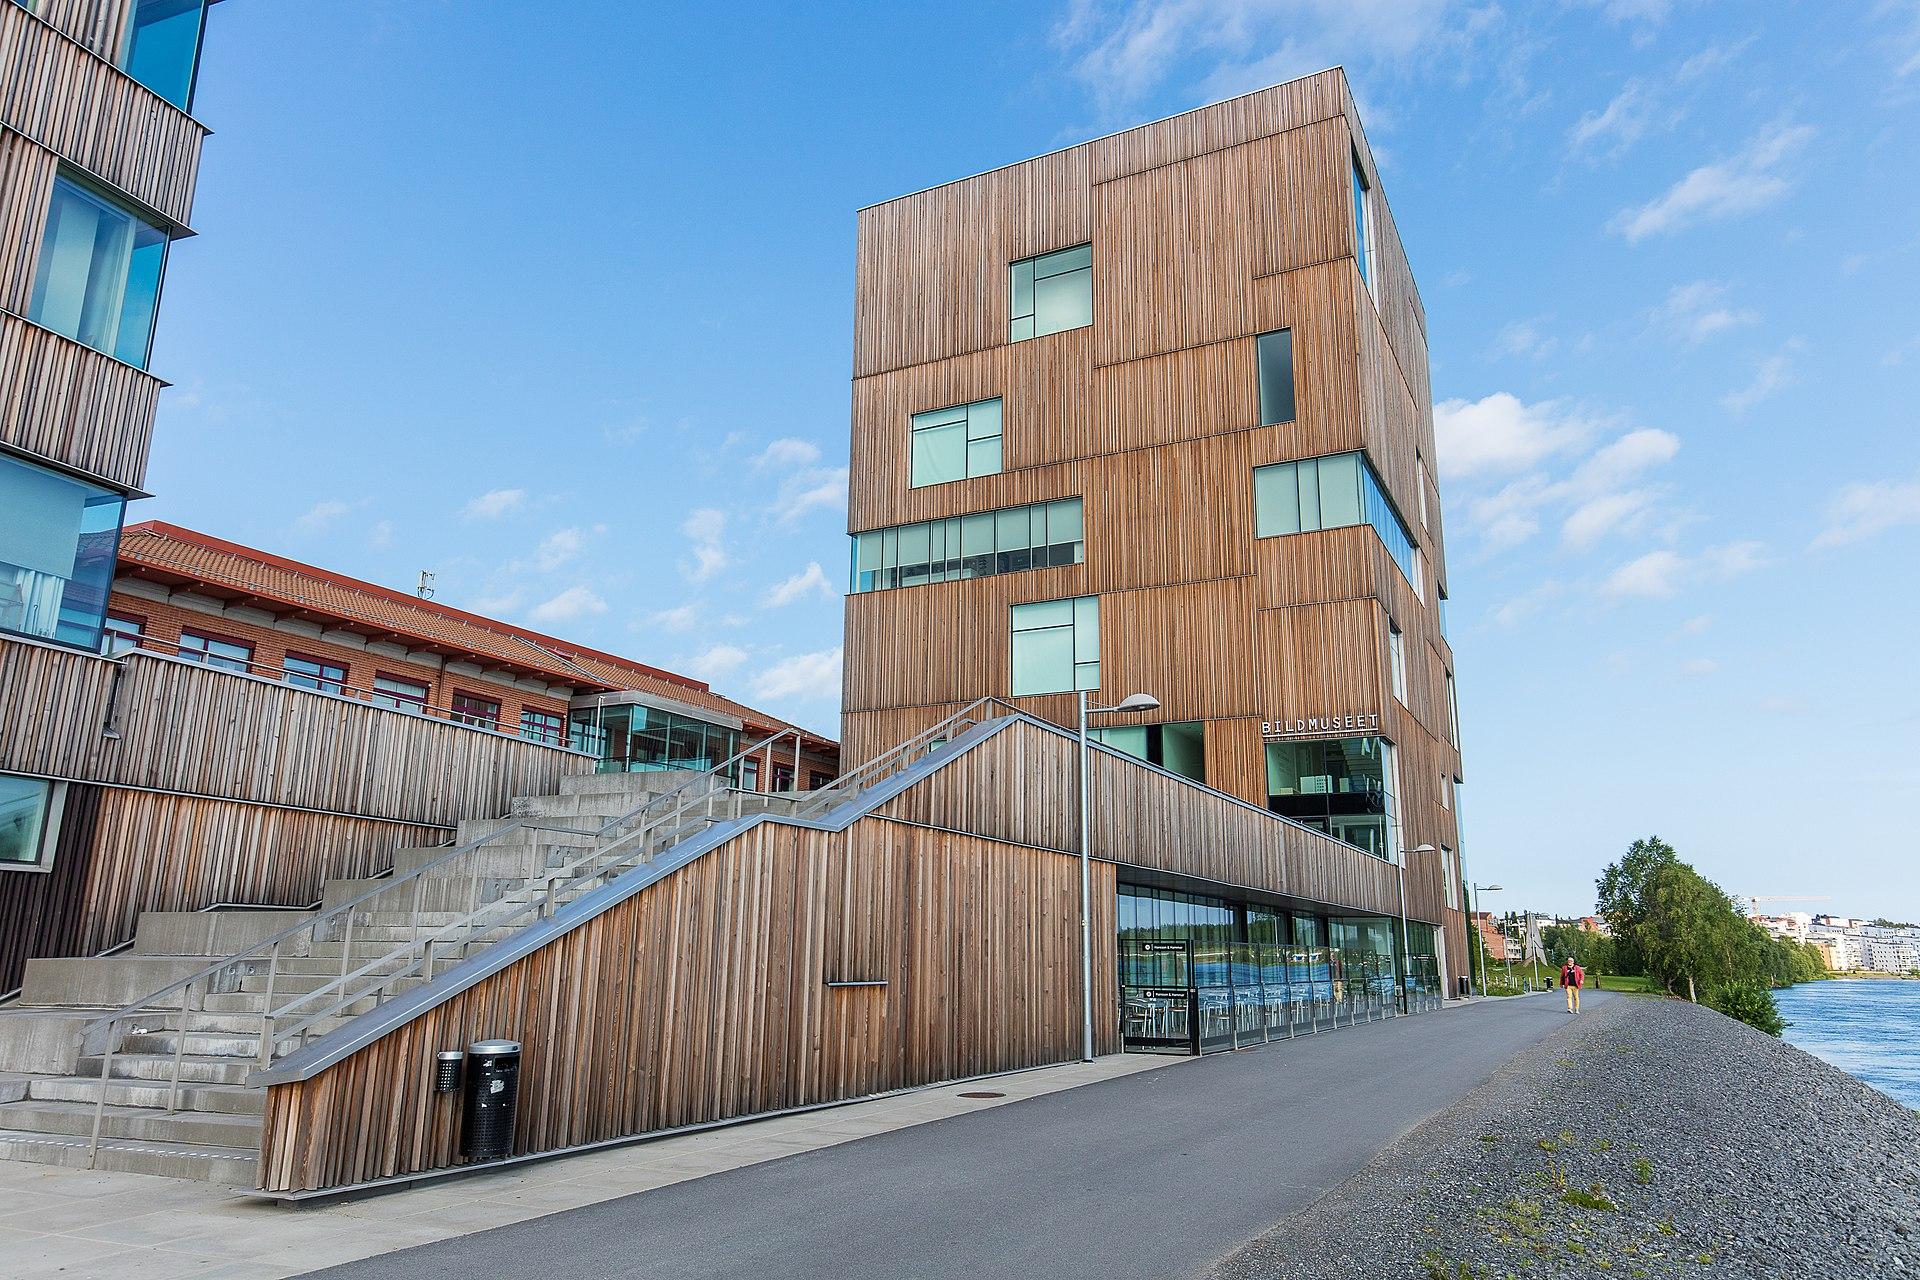 Bilmuseet in Umea, Sweden